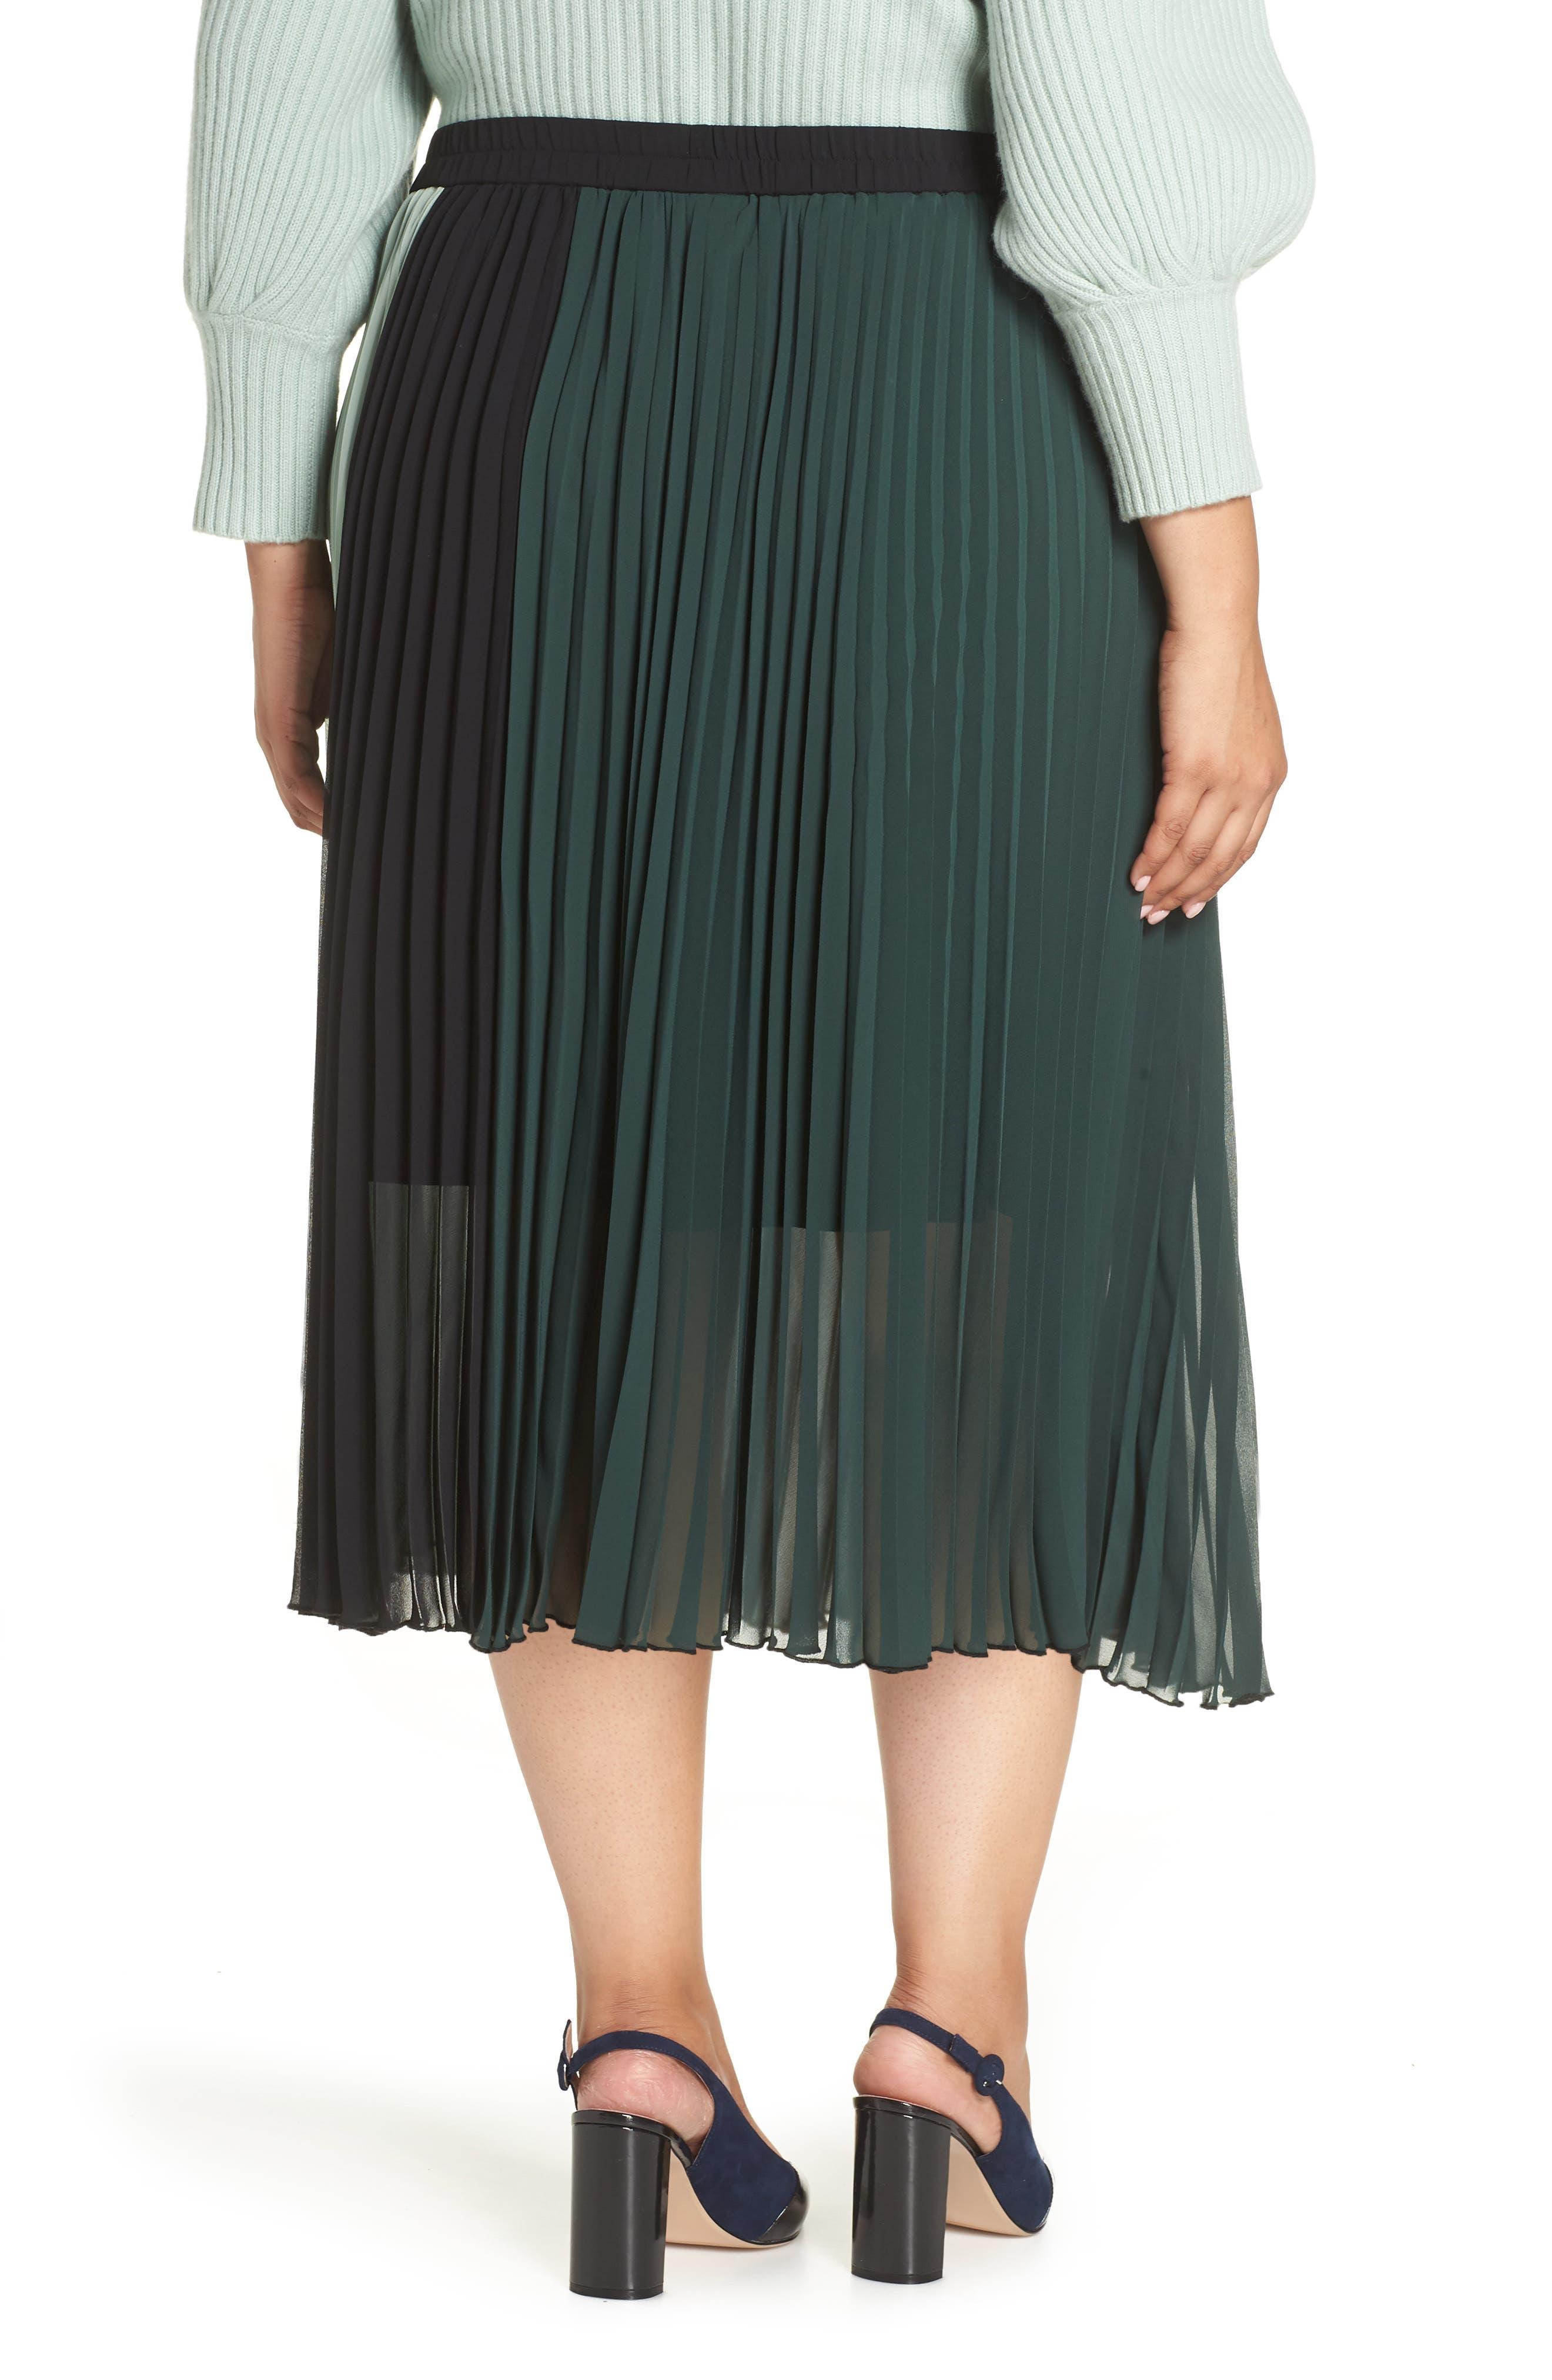 x Atlantic-Pacific Colorblock Pleated Midi Skirt,                             Alternate thumbnail 2, color,                             GREEN- BLACK COLORBLOCK